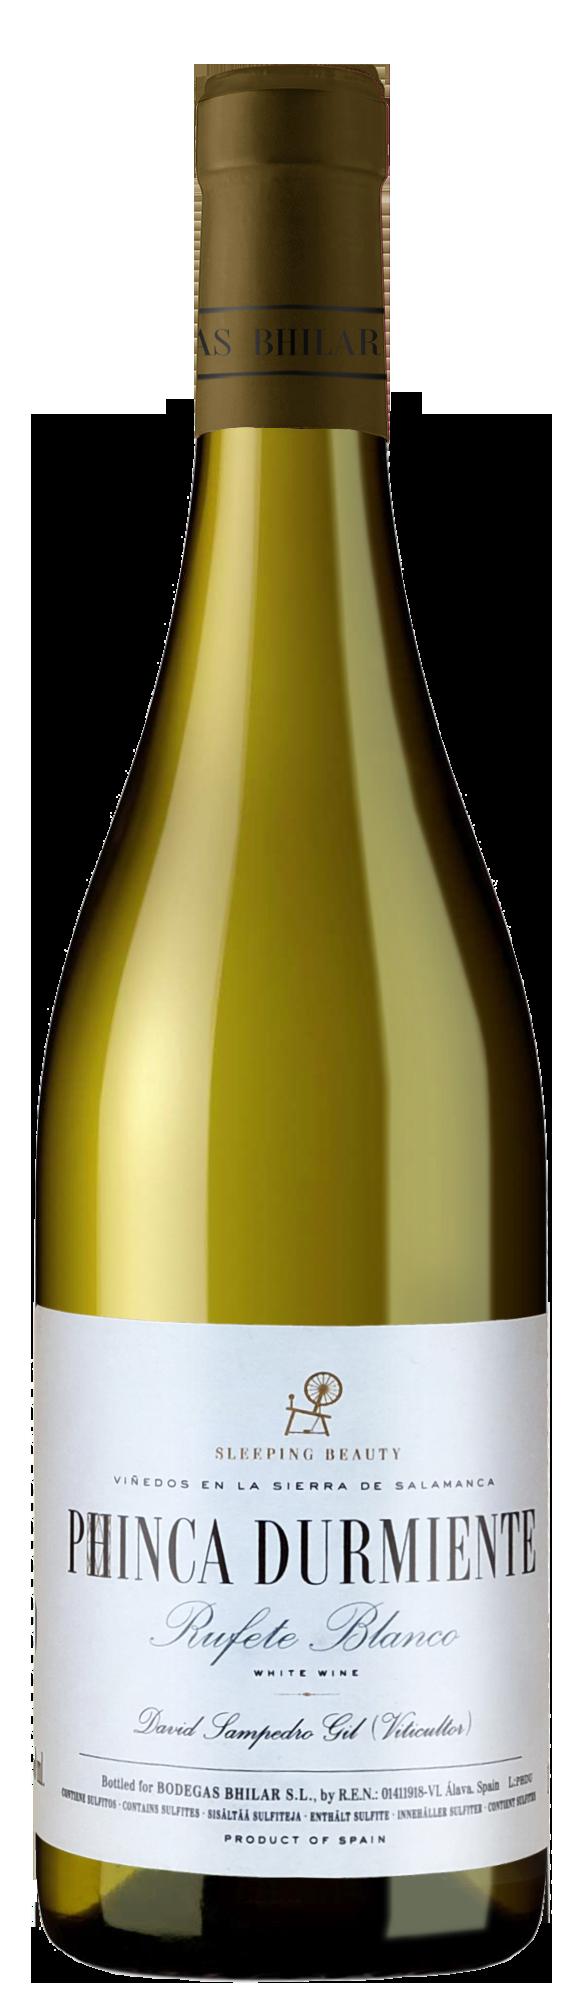 Bodegas Bhilar Phinca Durmiente Rufete Blanco - магазин склад winewine